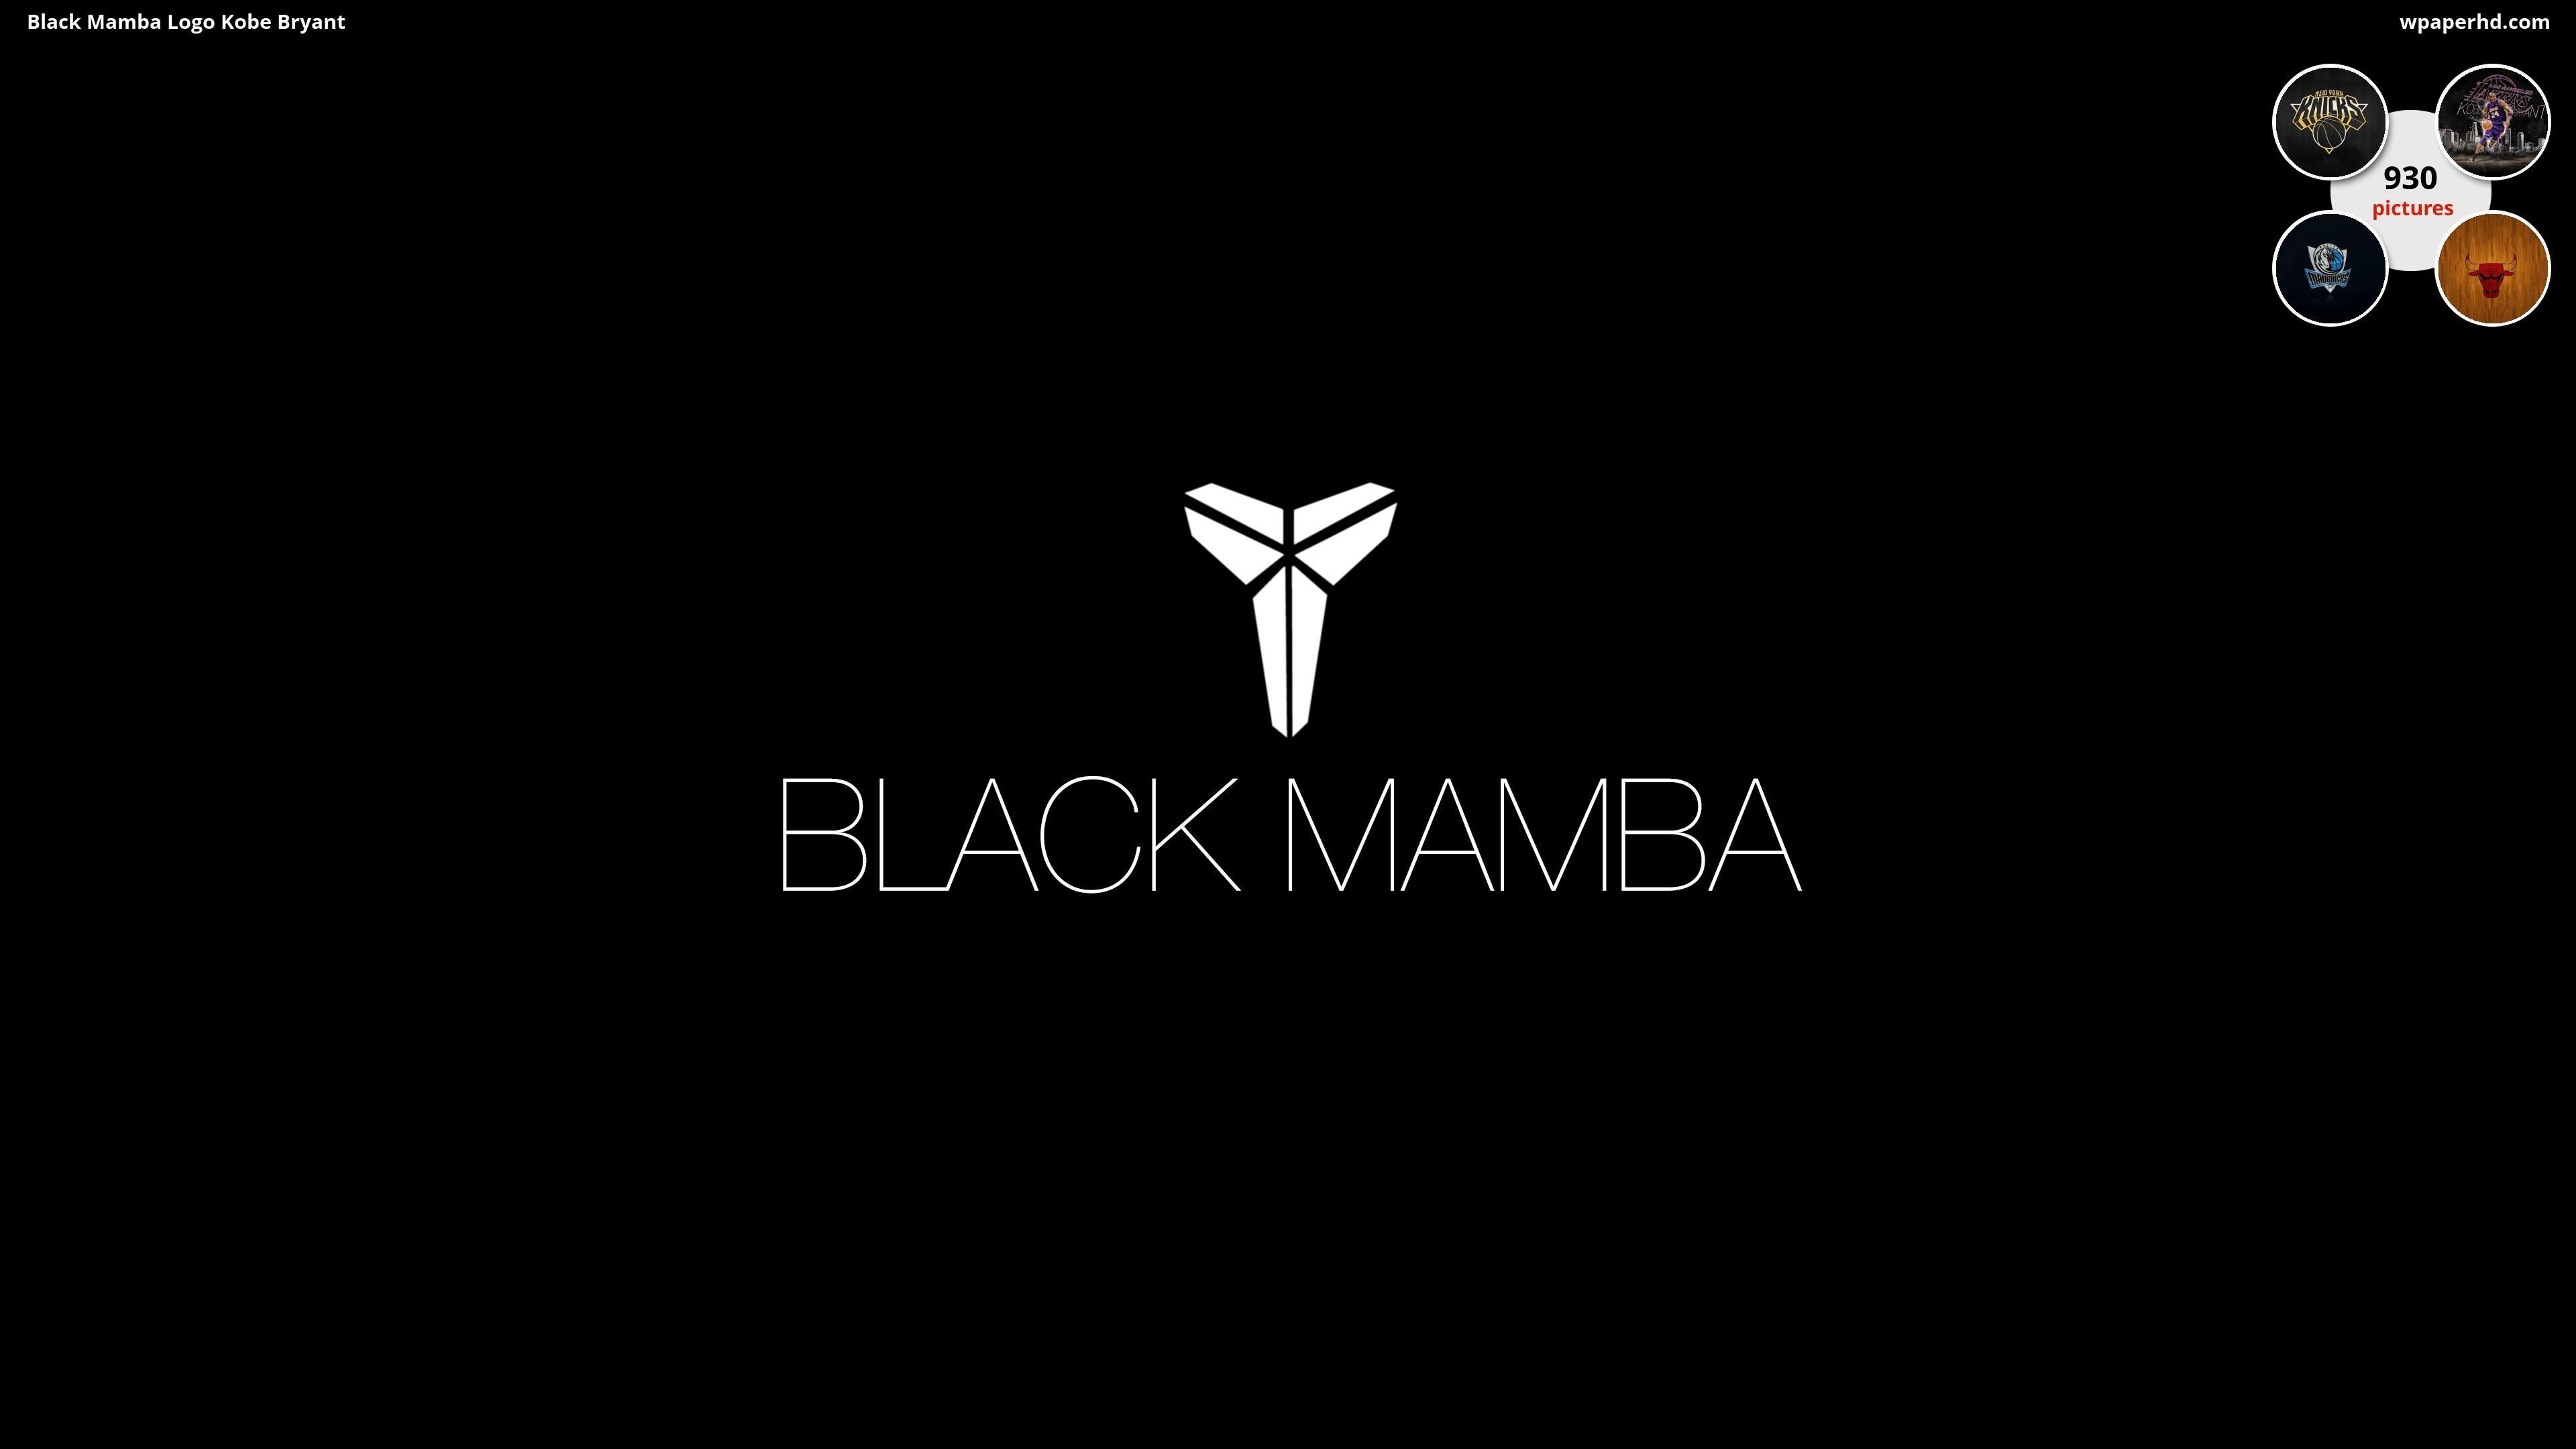 Kobe Bryant Wallpaper Black Mamba 77 Images